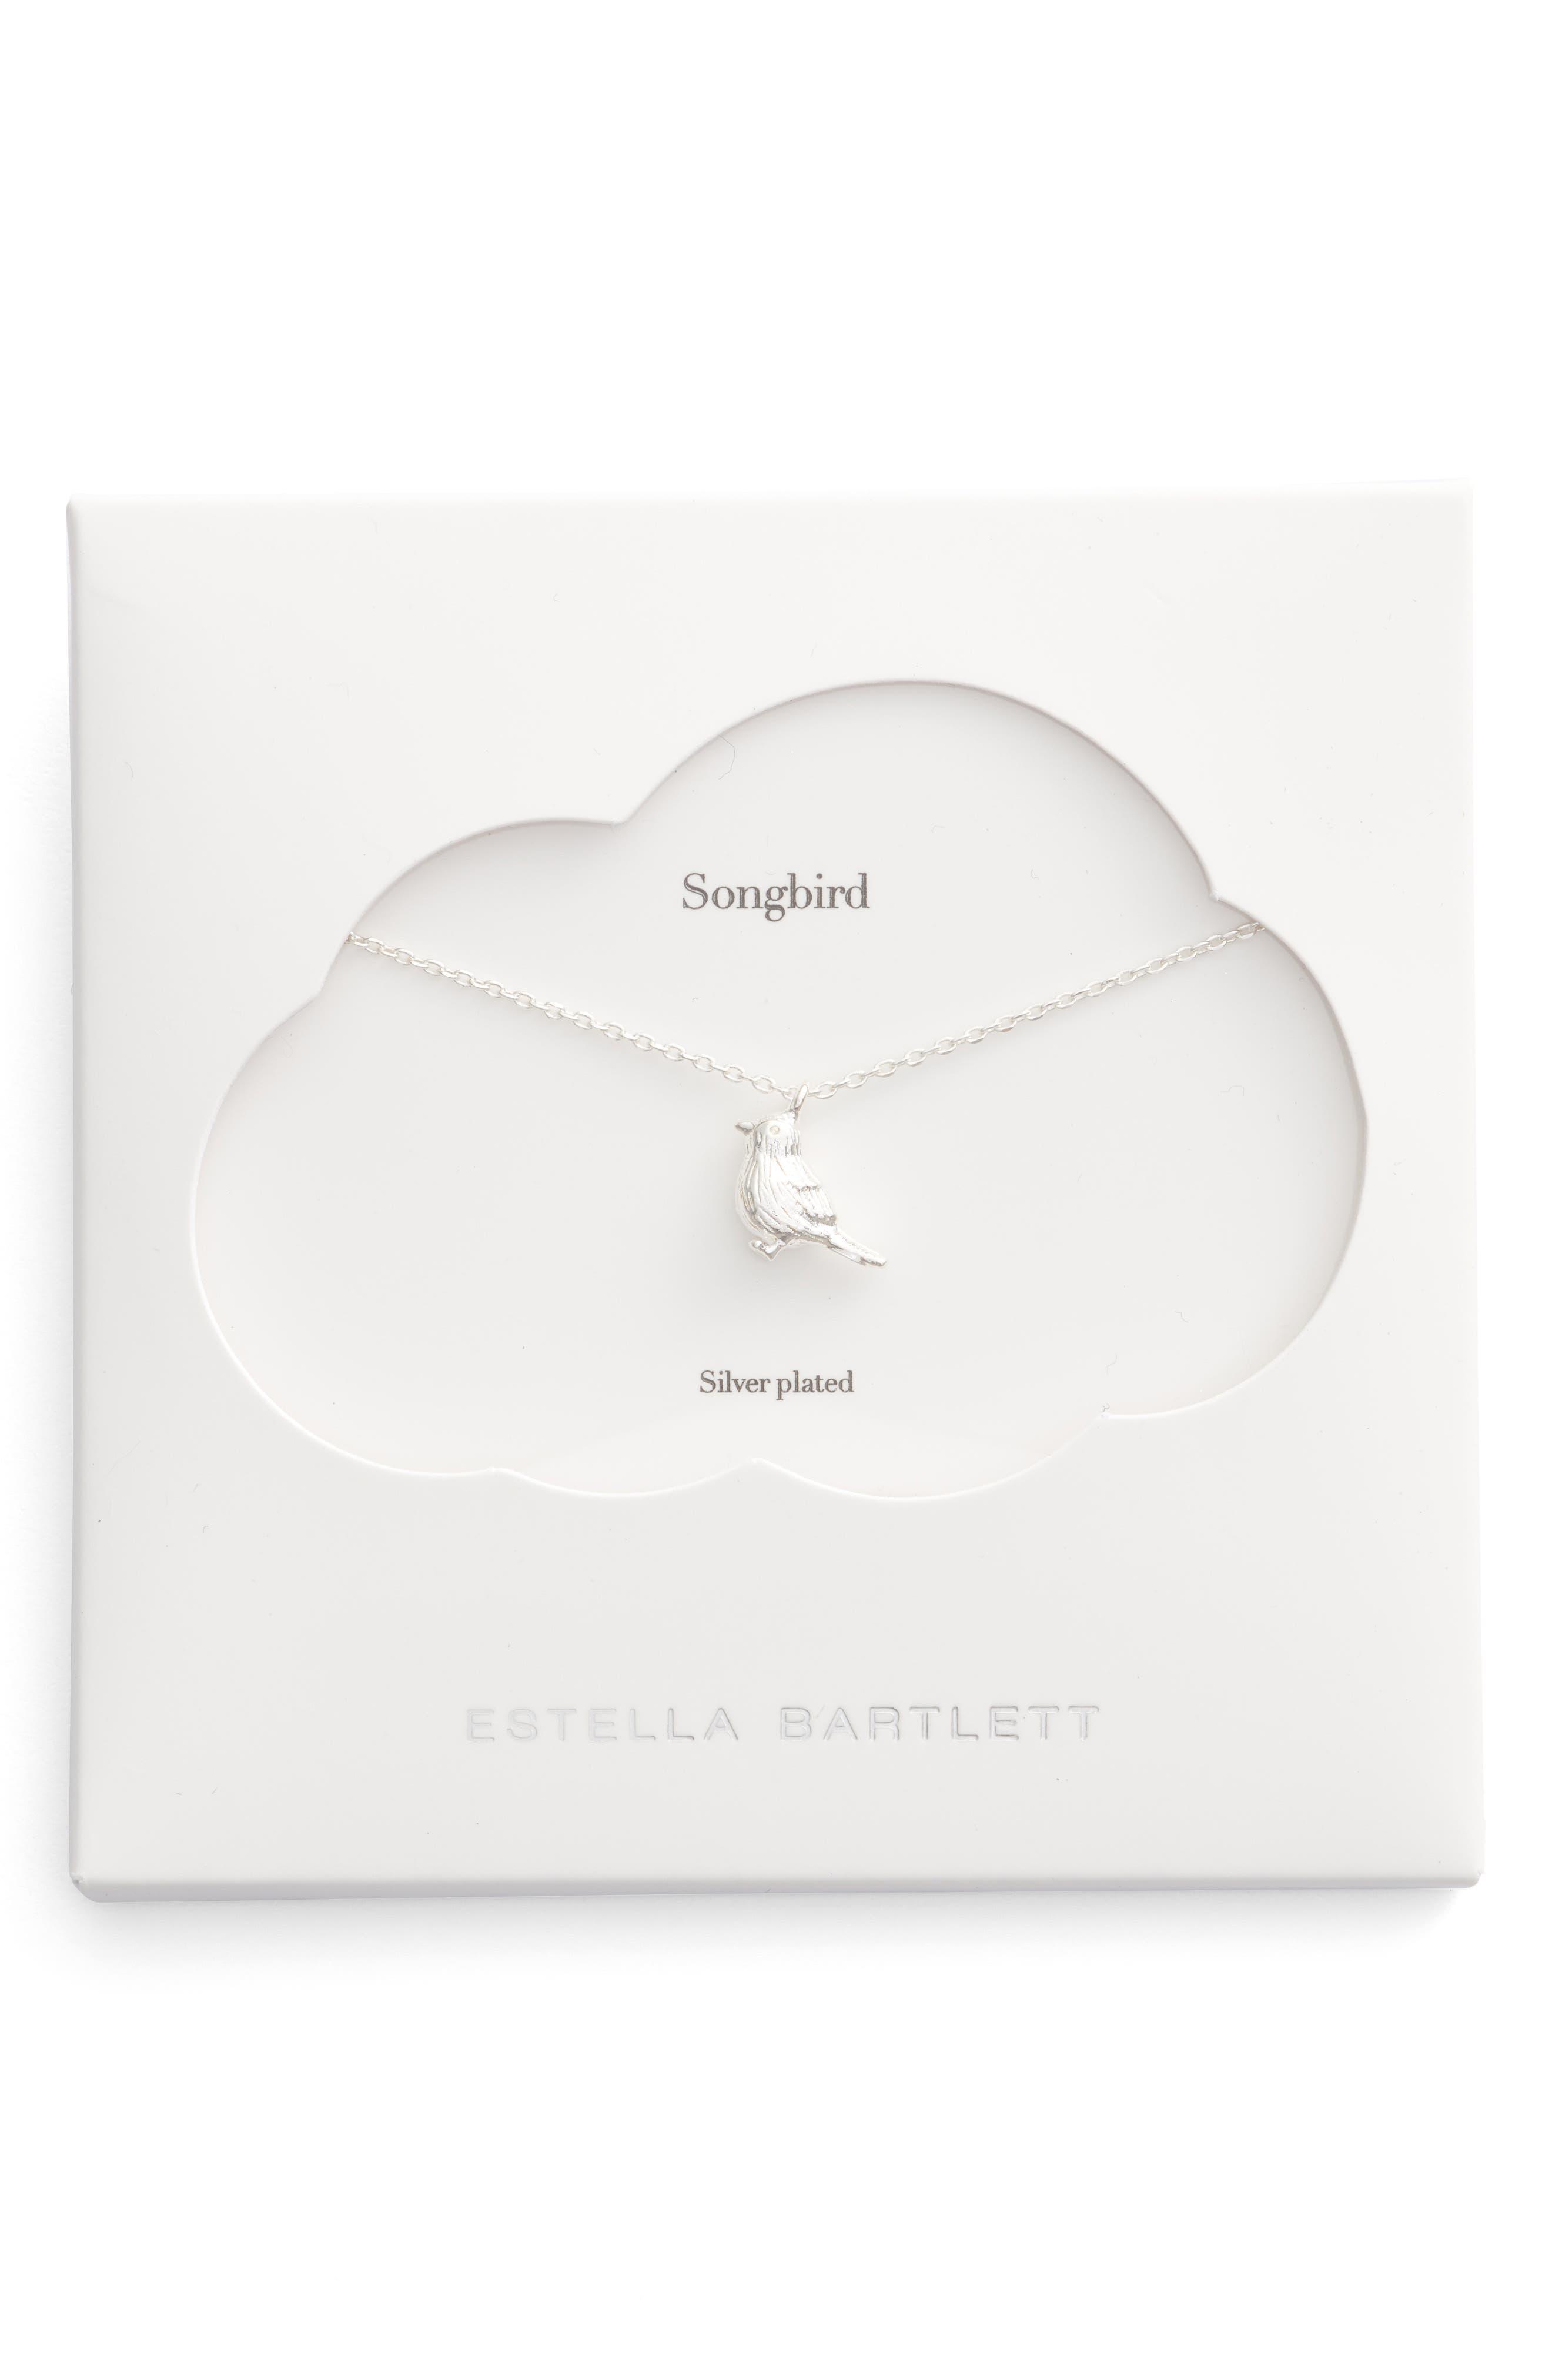 ESTELLA BARTLETT Robin Songbird Pendant Necklace